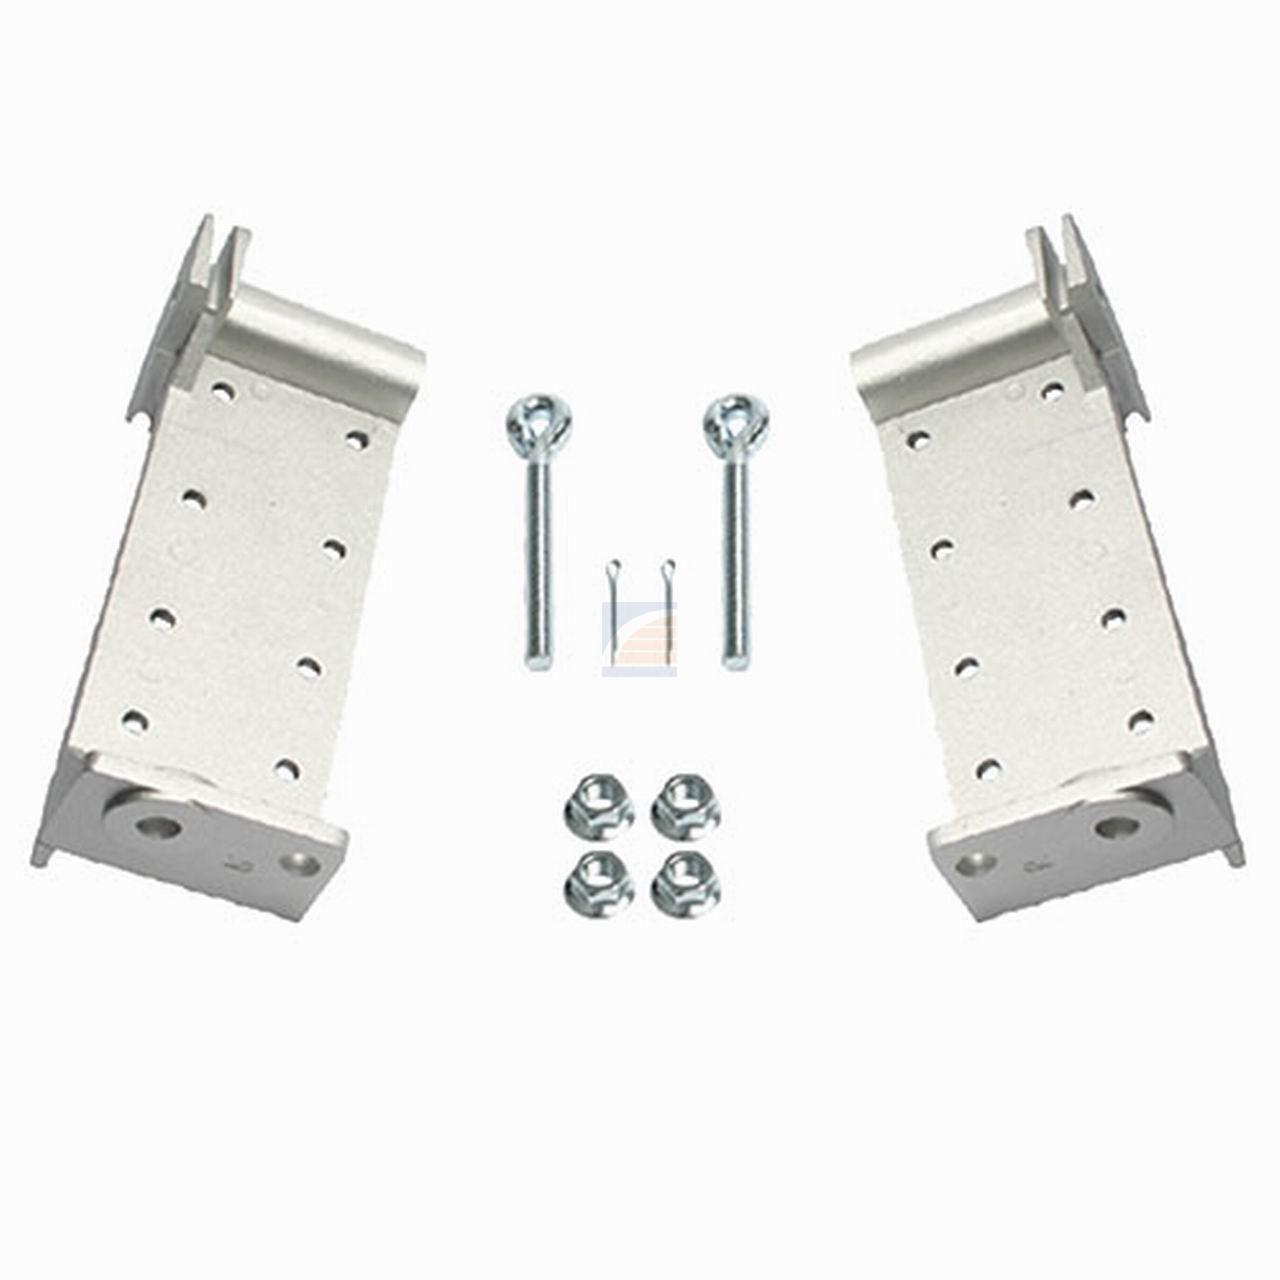 Bodemconsole aluminium verstelbaar